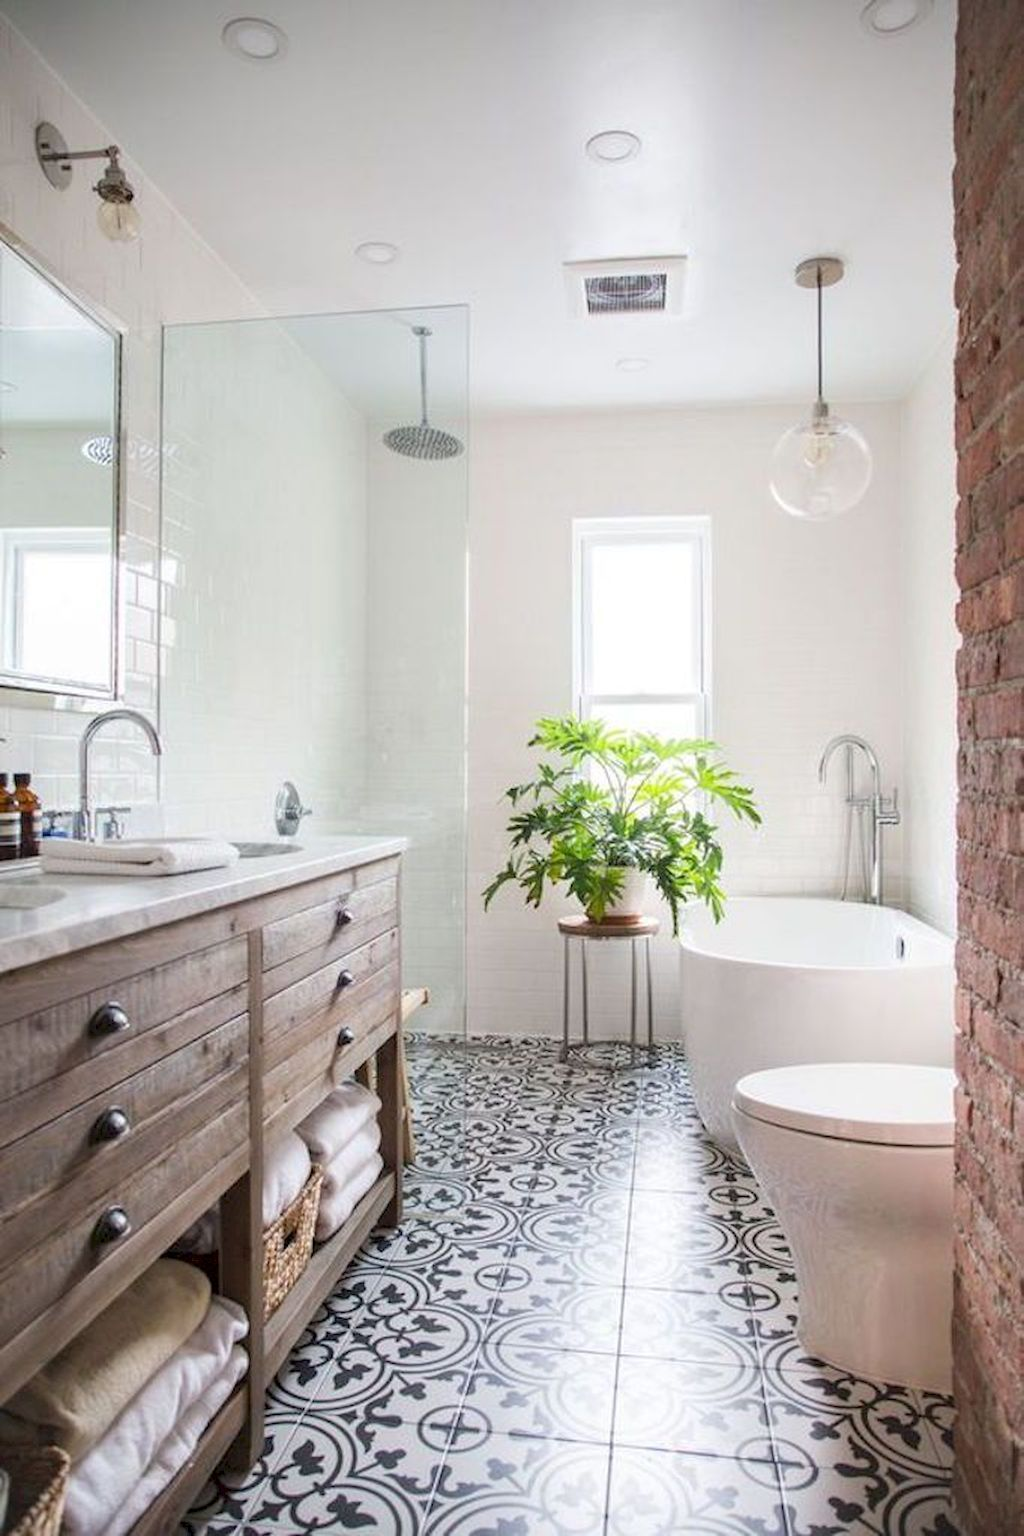 Gorgeous 45 Farmhouse Rustic Bathroom Decor Ideas on A Budget https ...